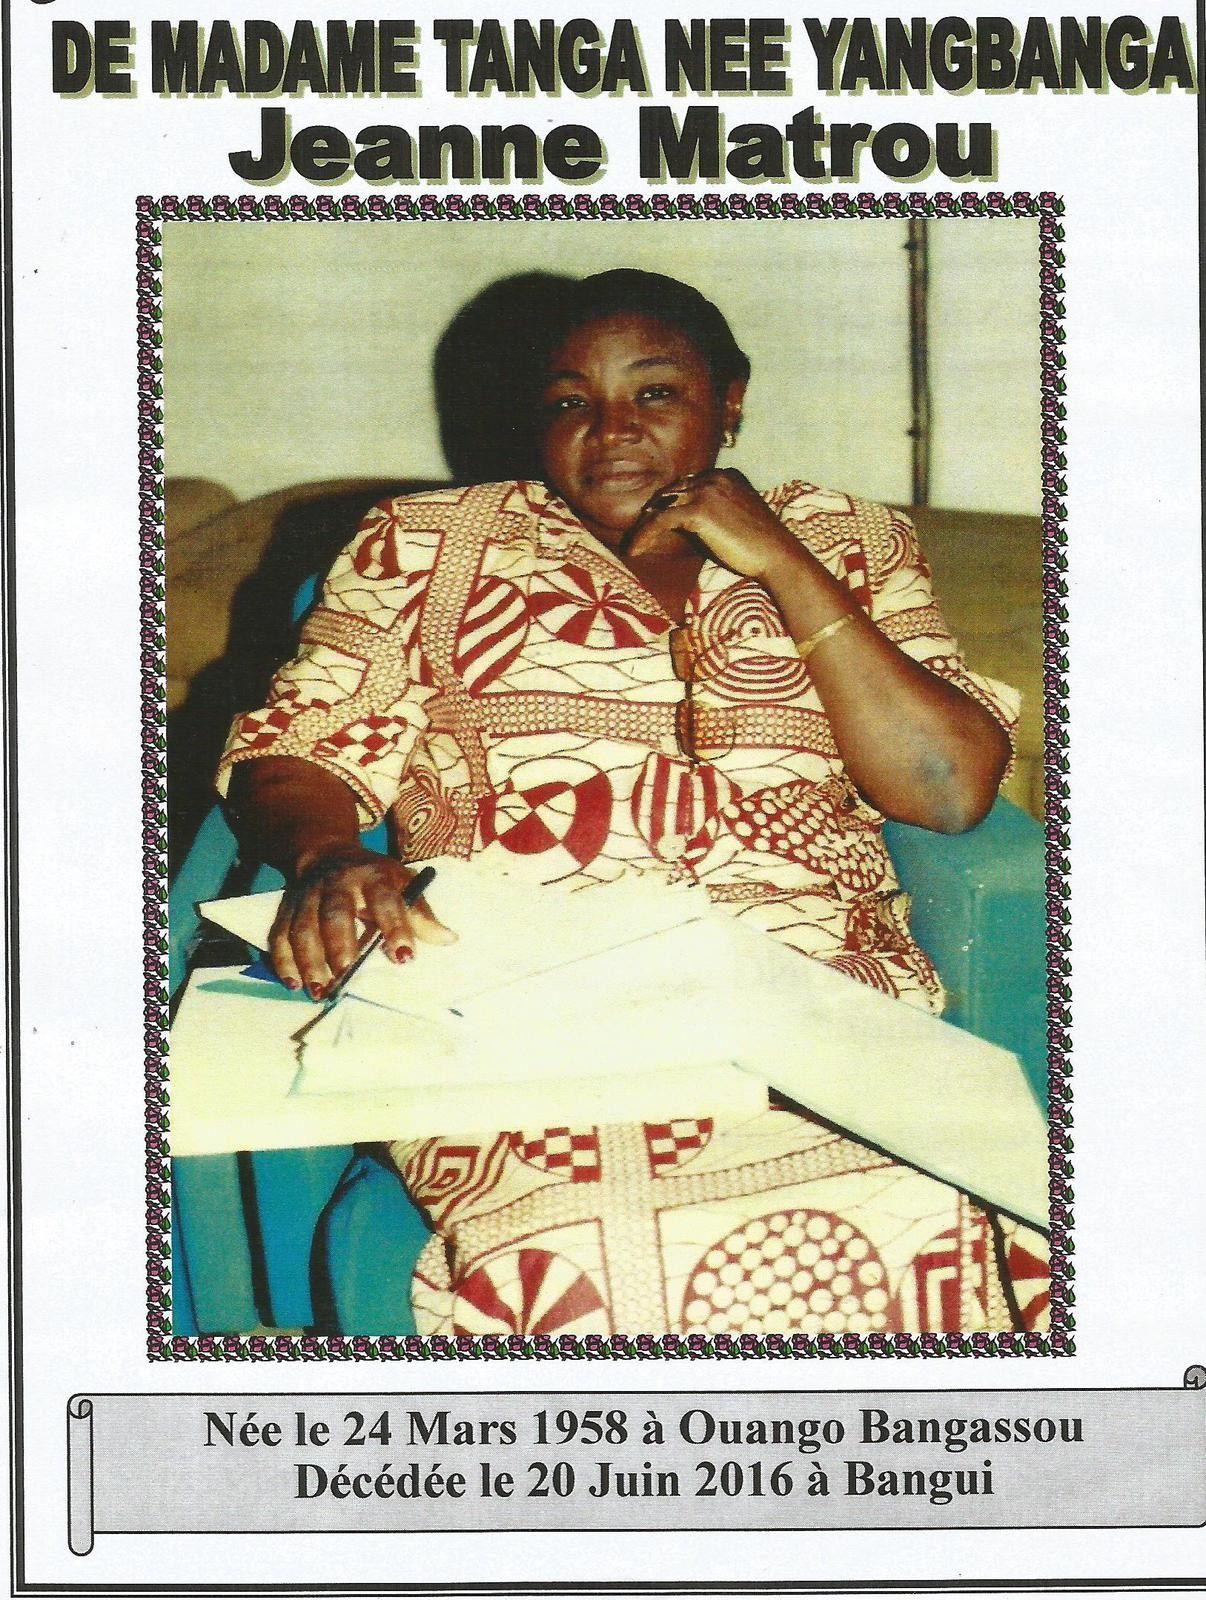 Obsèques de Mme Tanga née Jeanne Matrou Yangbanga